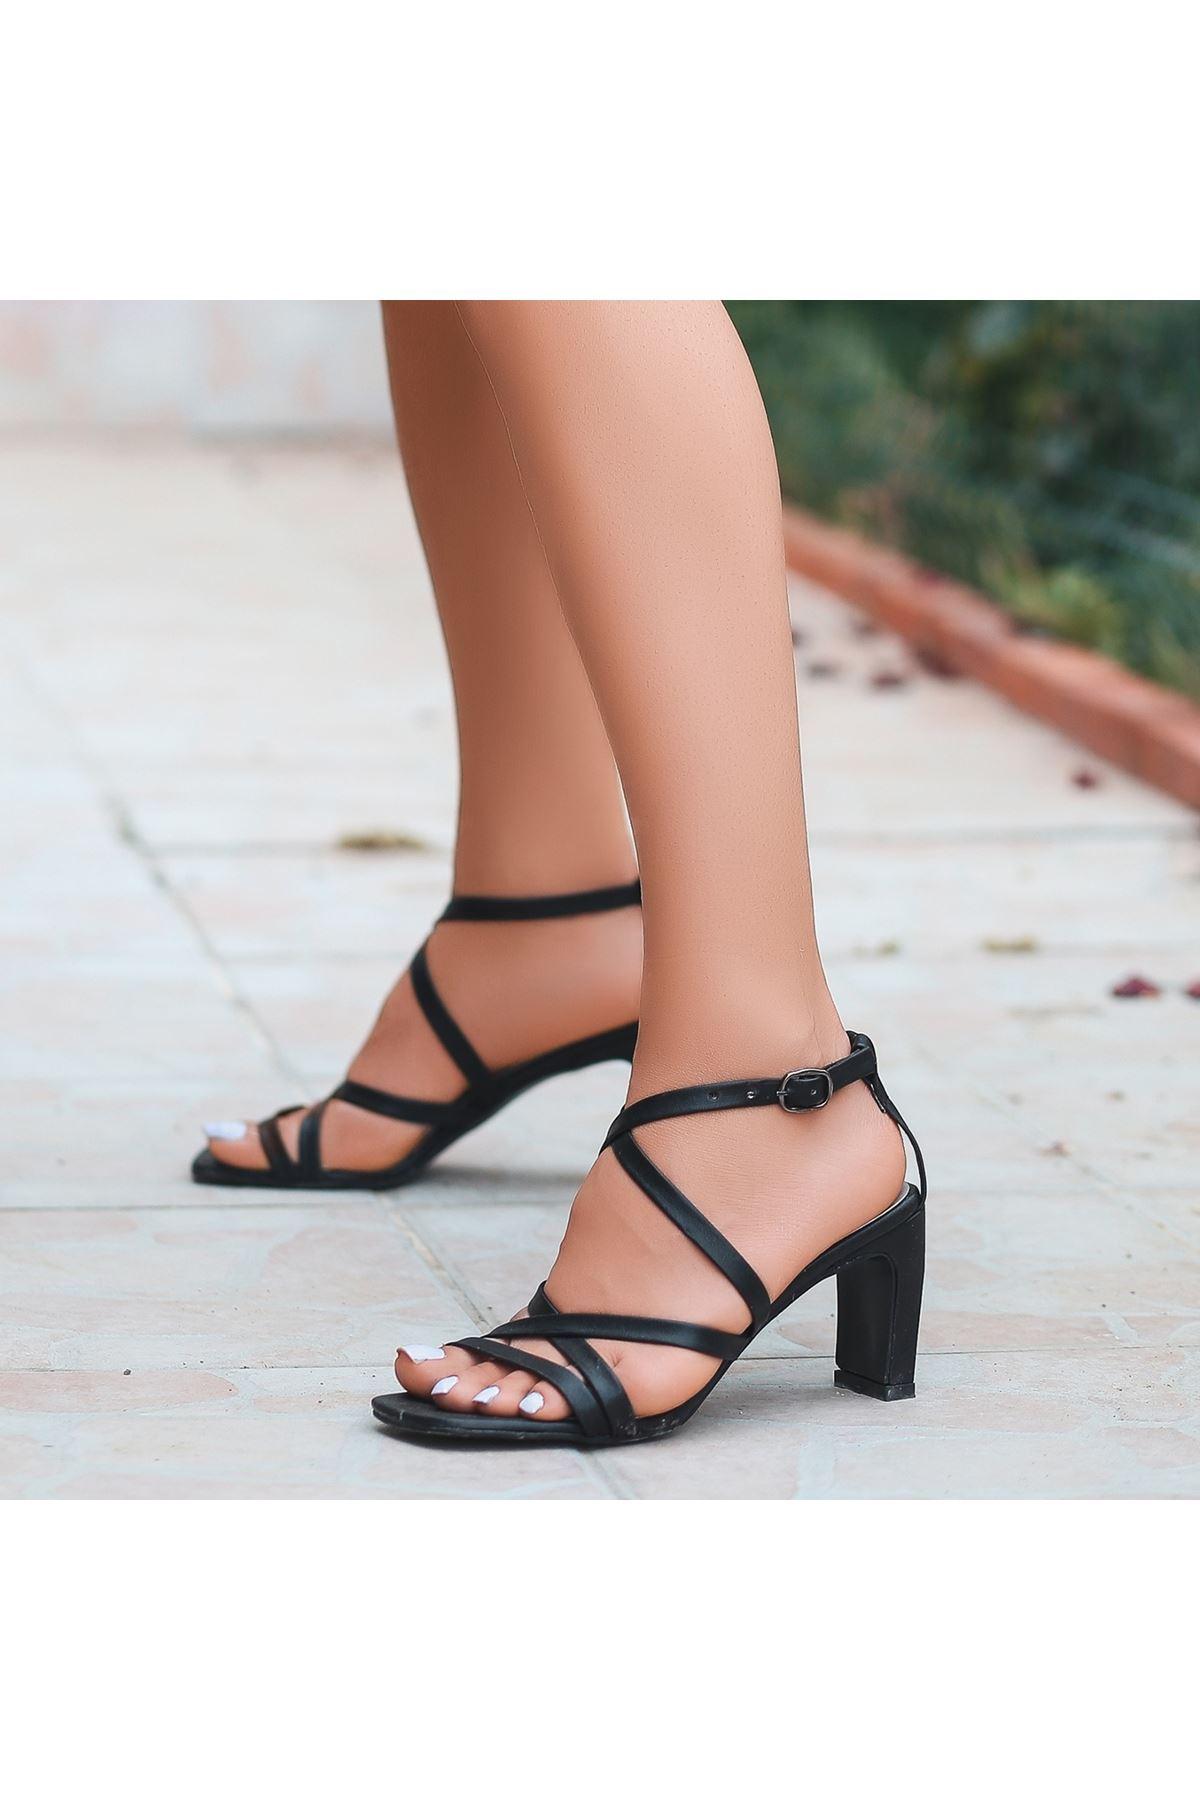 Utic Siyah Cilt Topuklu Ayakkabı